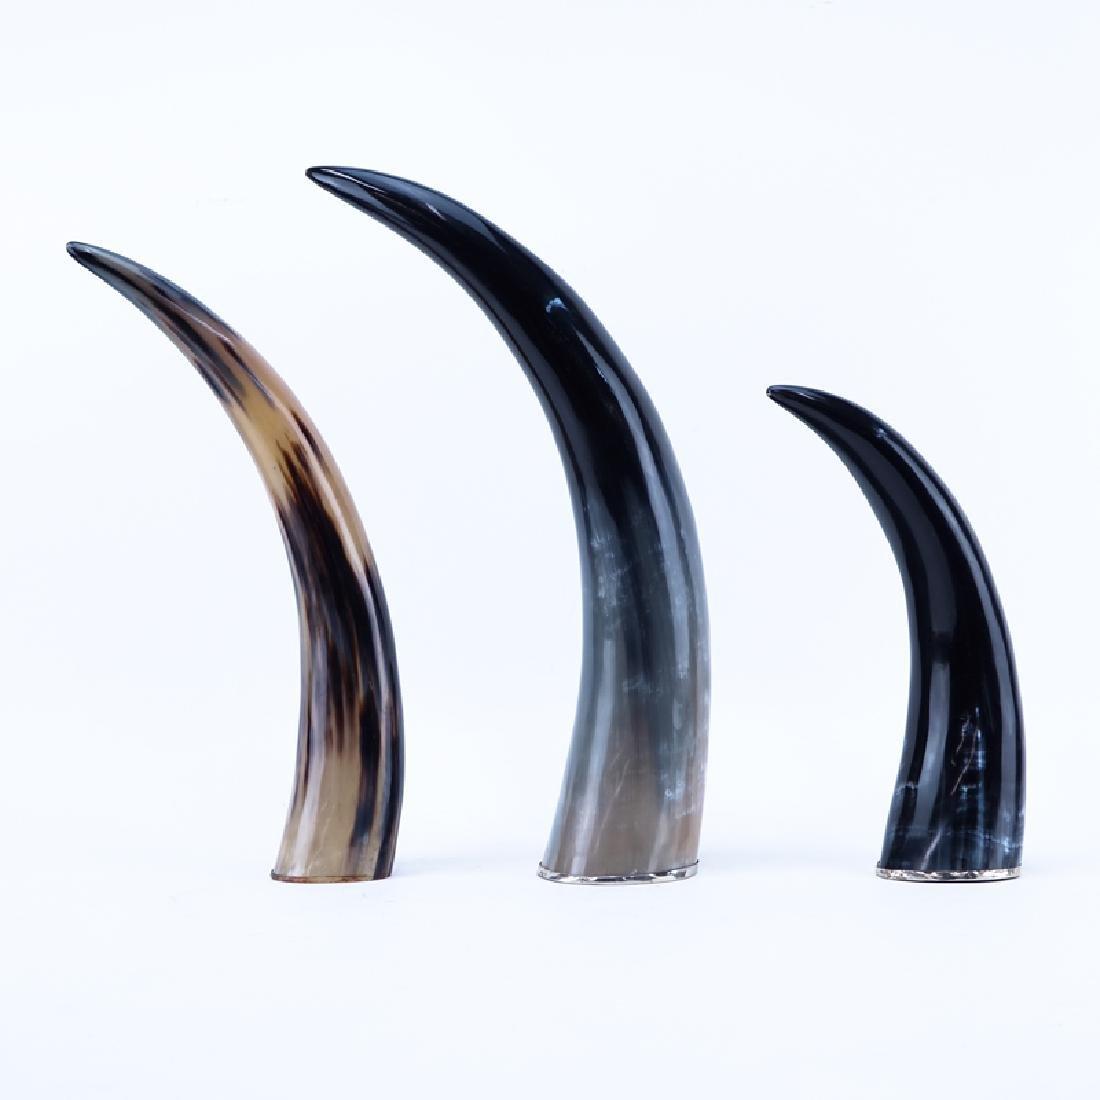 Set of Three (3) Decorative Polished Horns